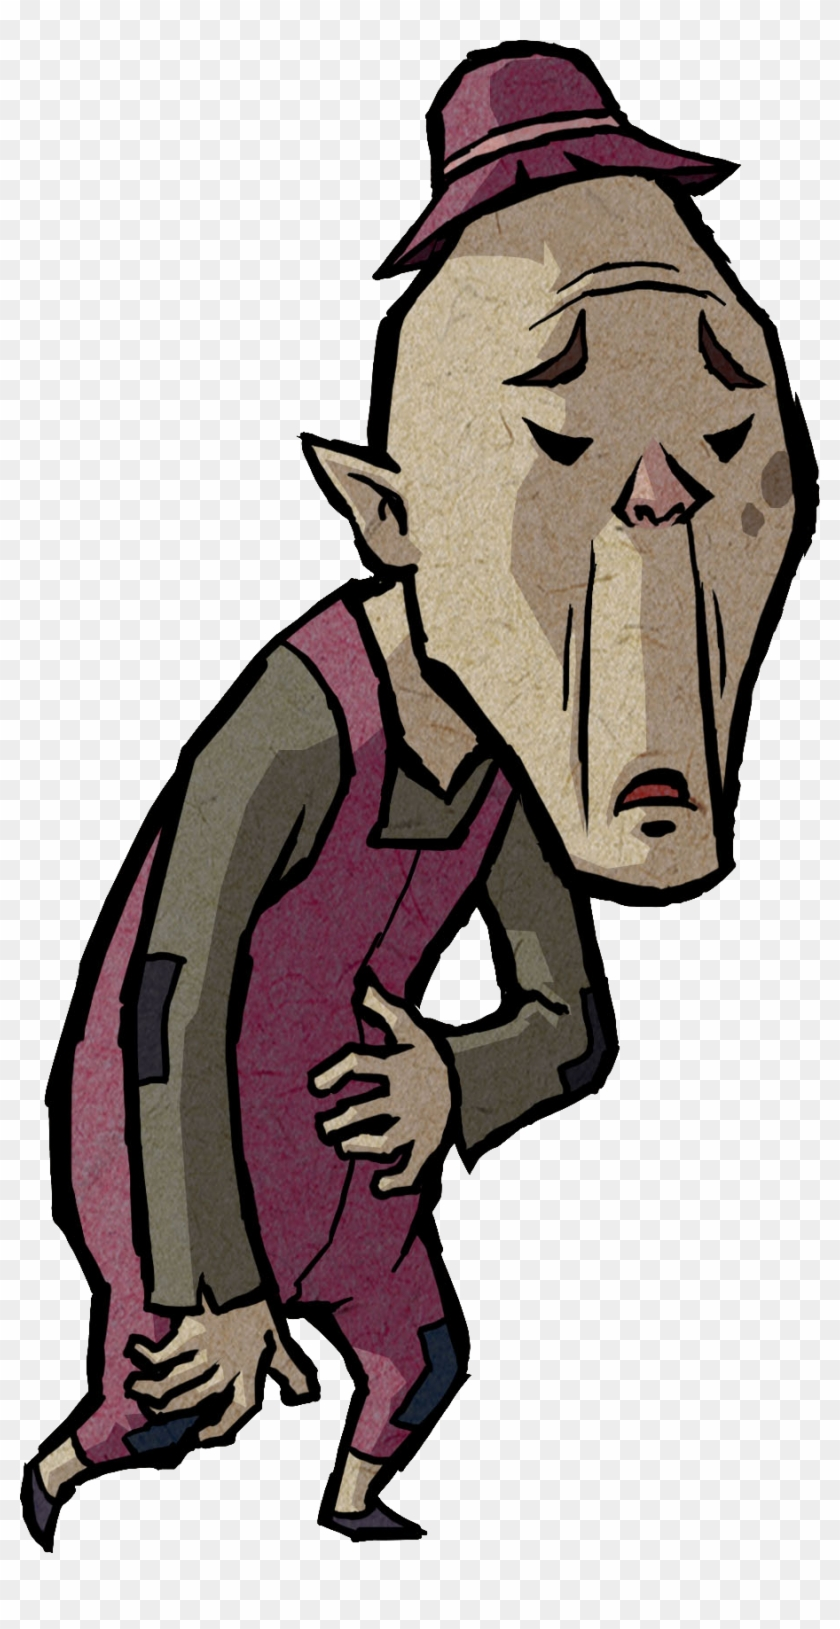 Legend Of Zelda Wind Waker Old Man #86119